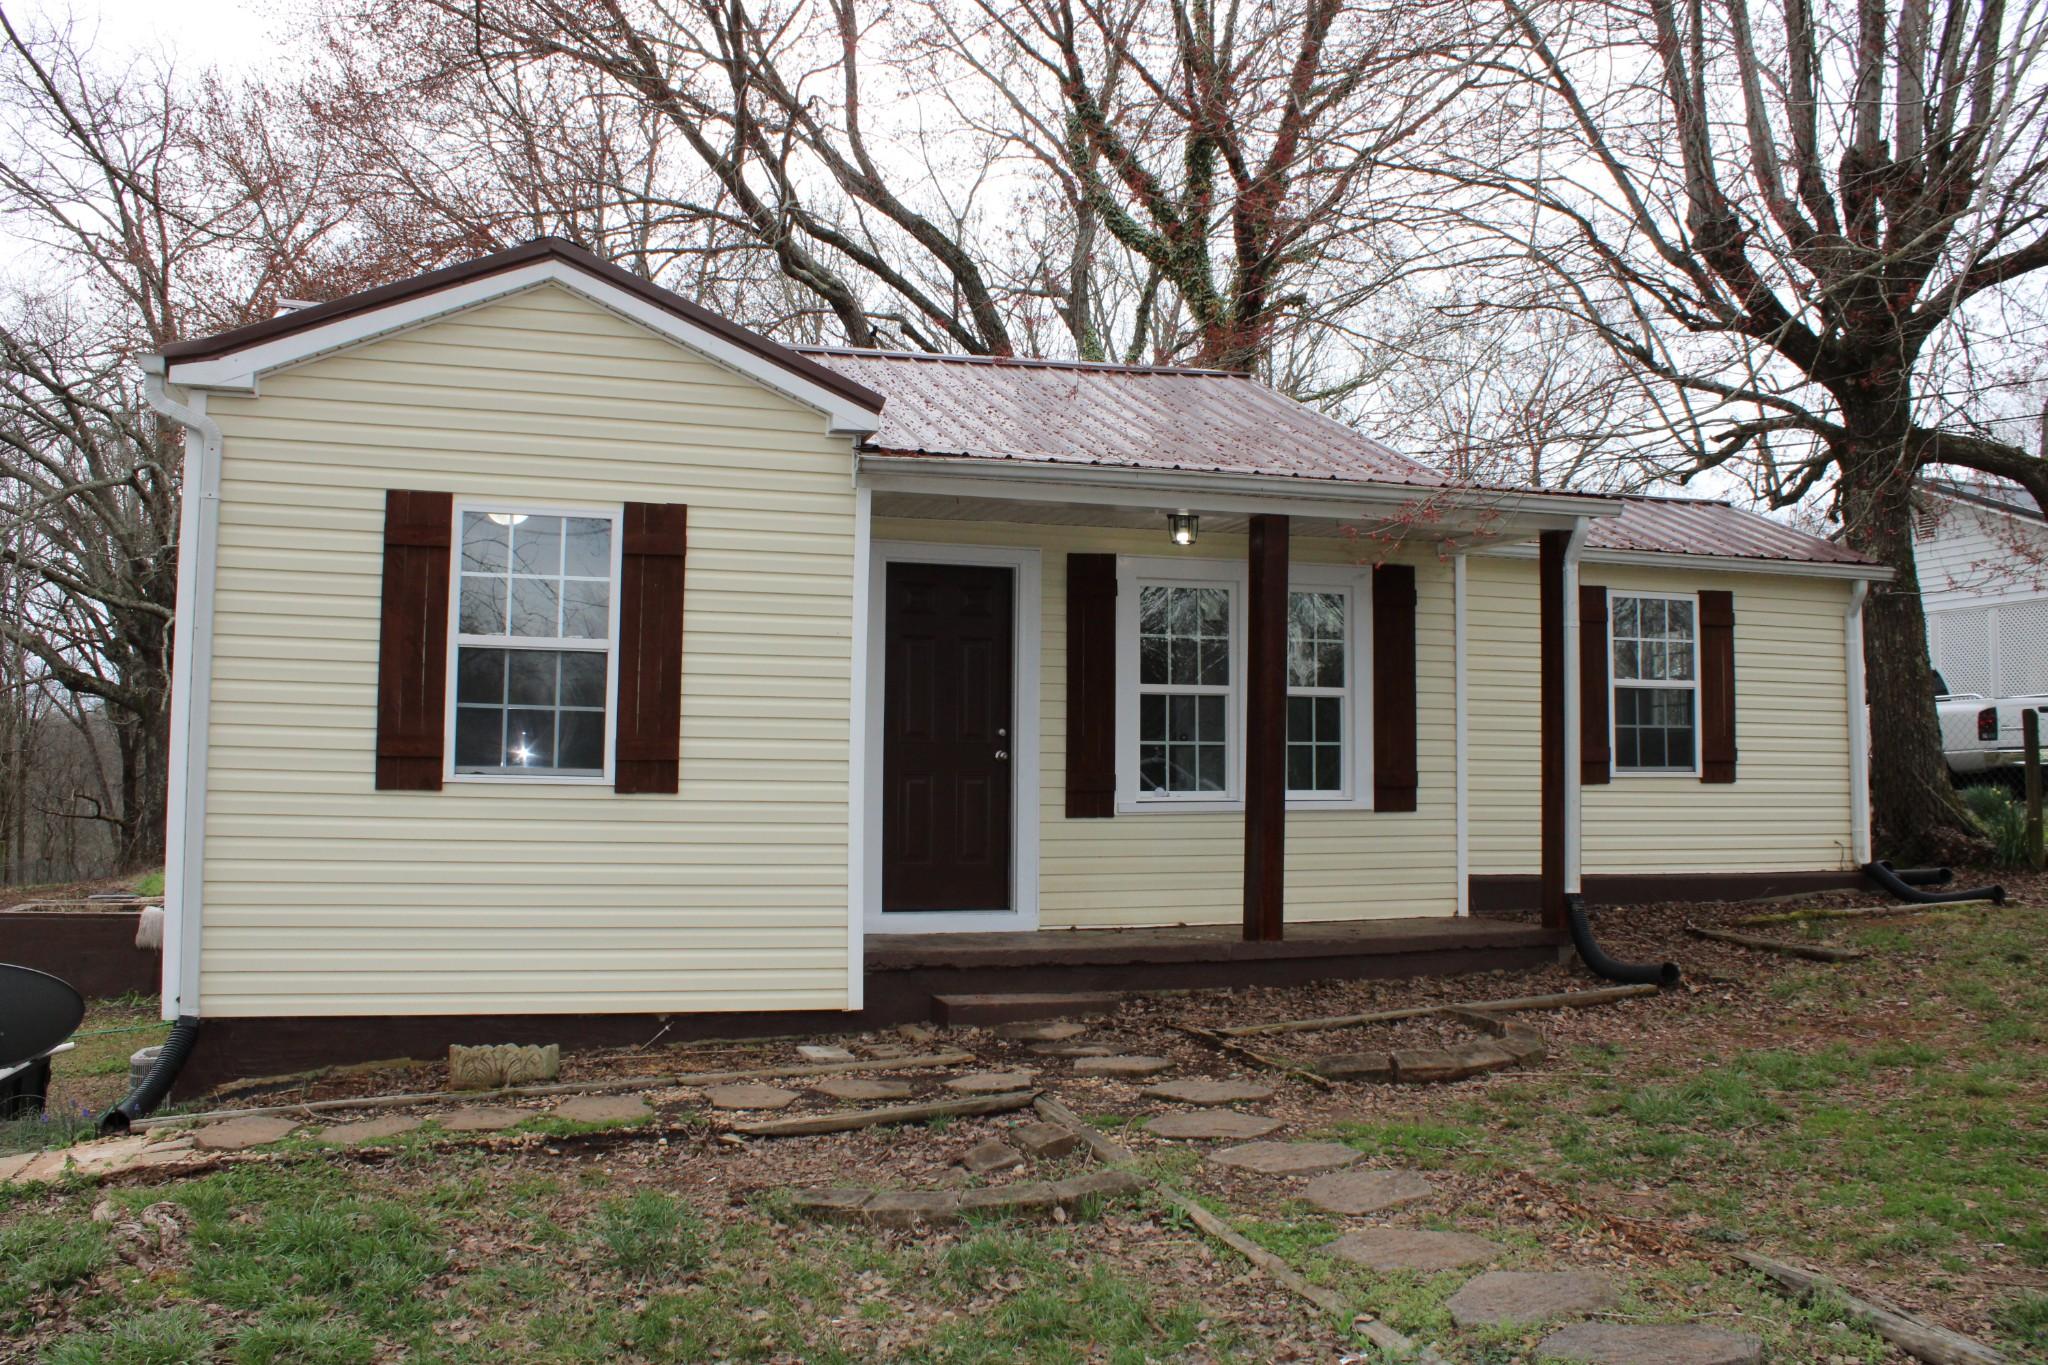 251 S Riverside Dr, Mc Minnville, TN 37110 - Mc Minnville, TN real estate listing